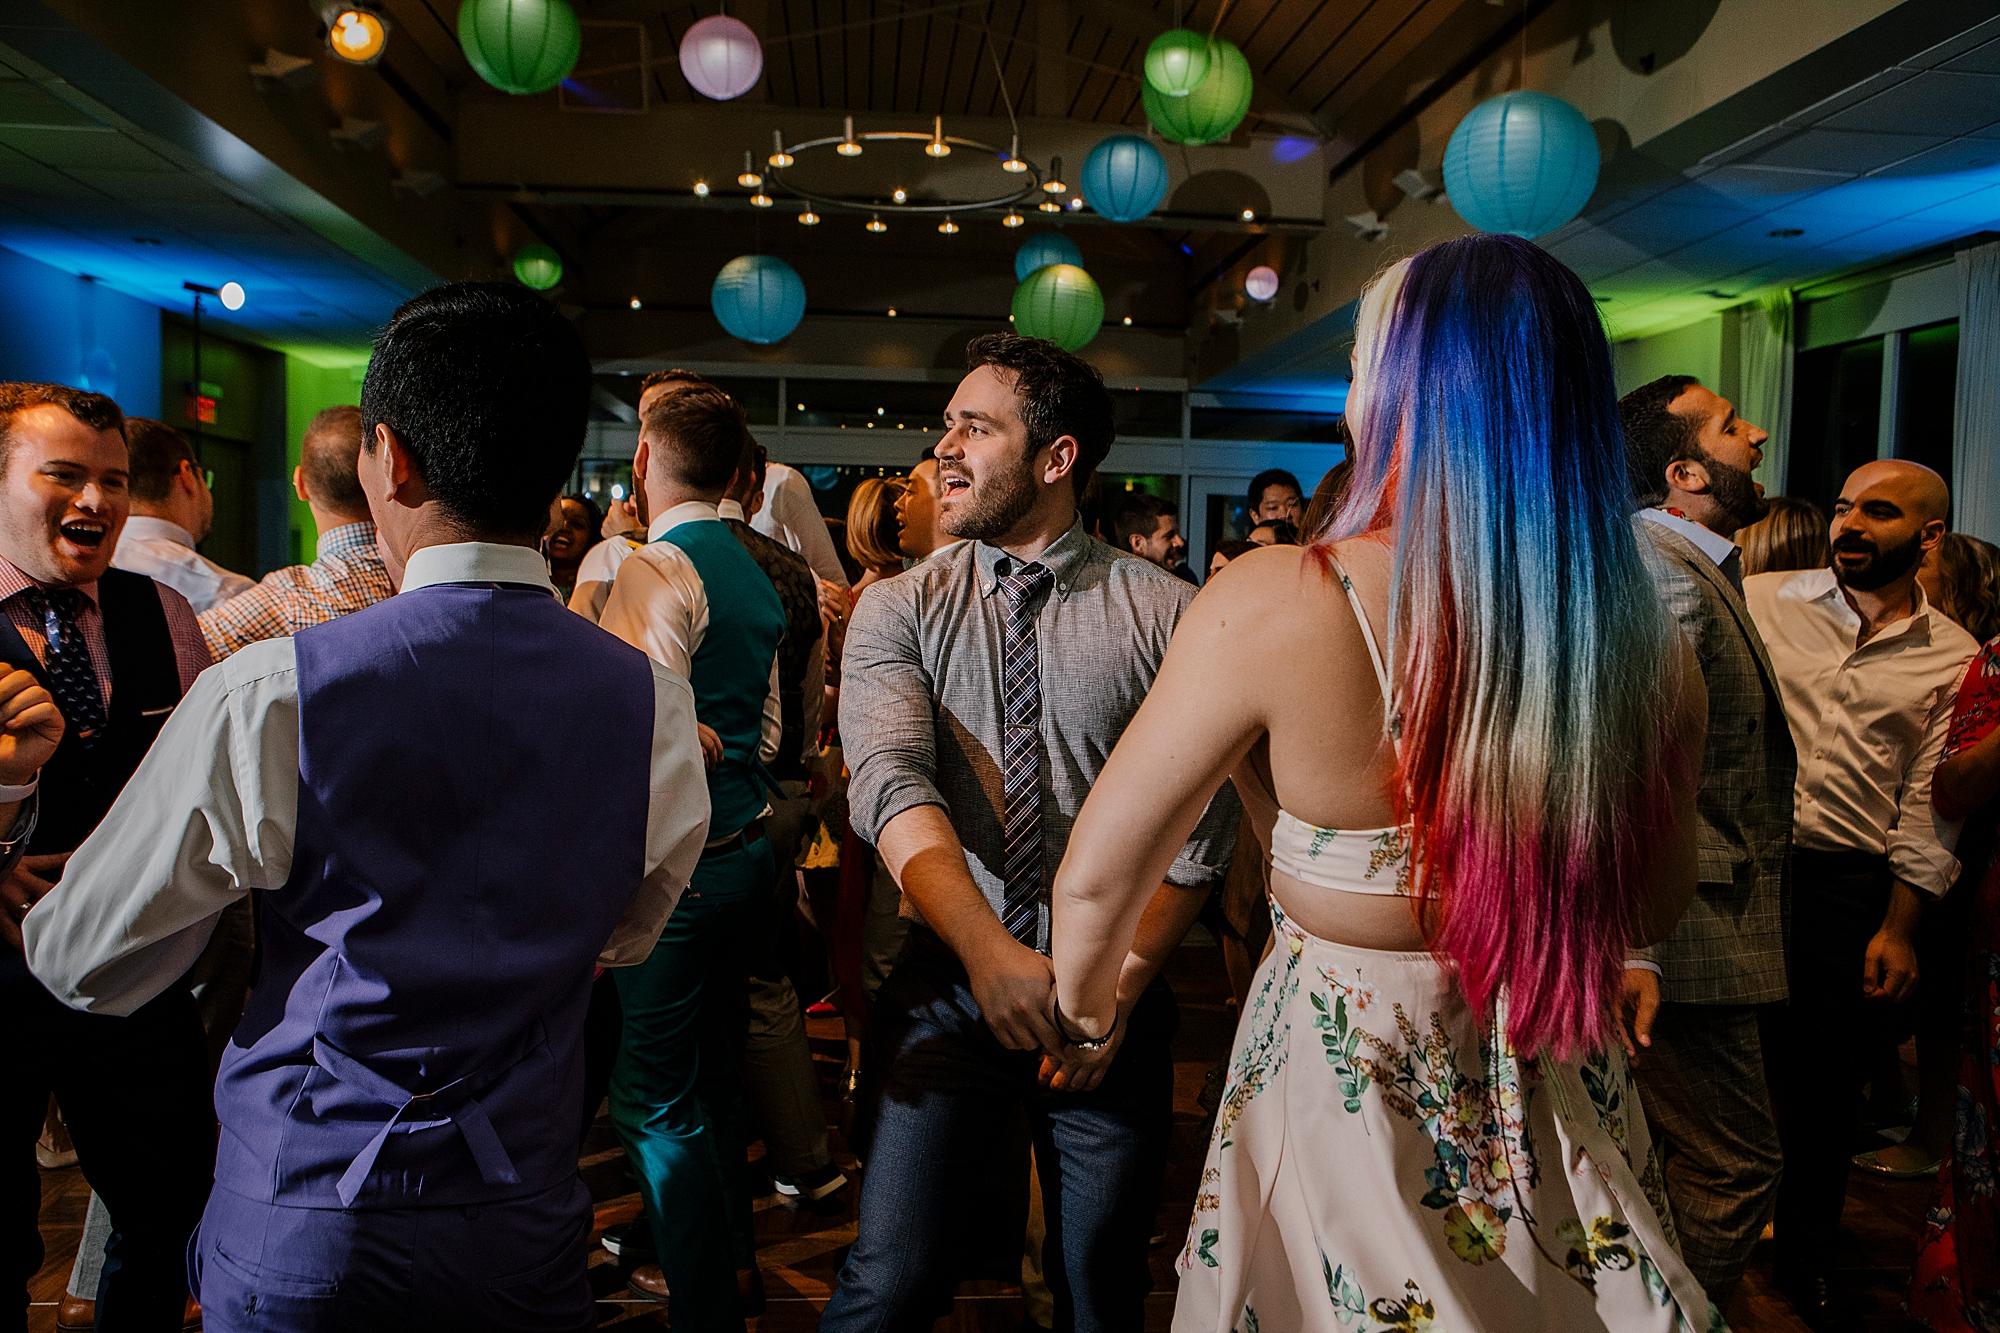 Dan_and_Byron_Love_by_Joe_Mac_Philadelphia_Wedding_LGBTQ_Photography_Gay_Independence_visitor_Center_137.JPG